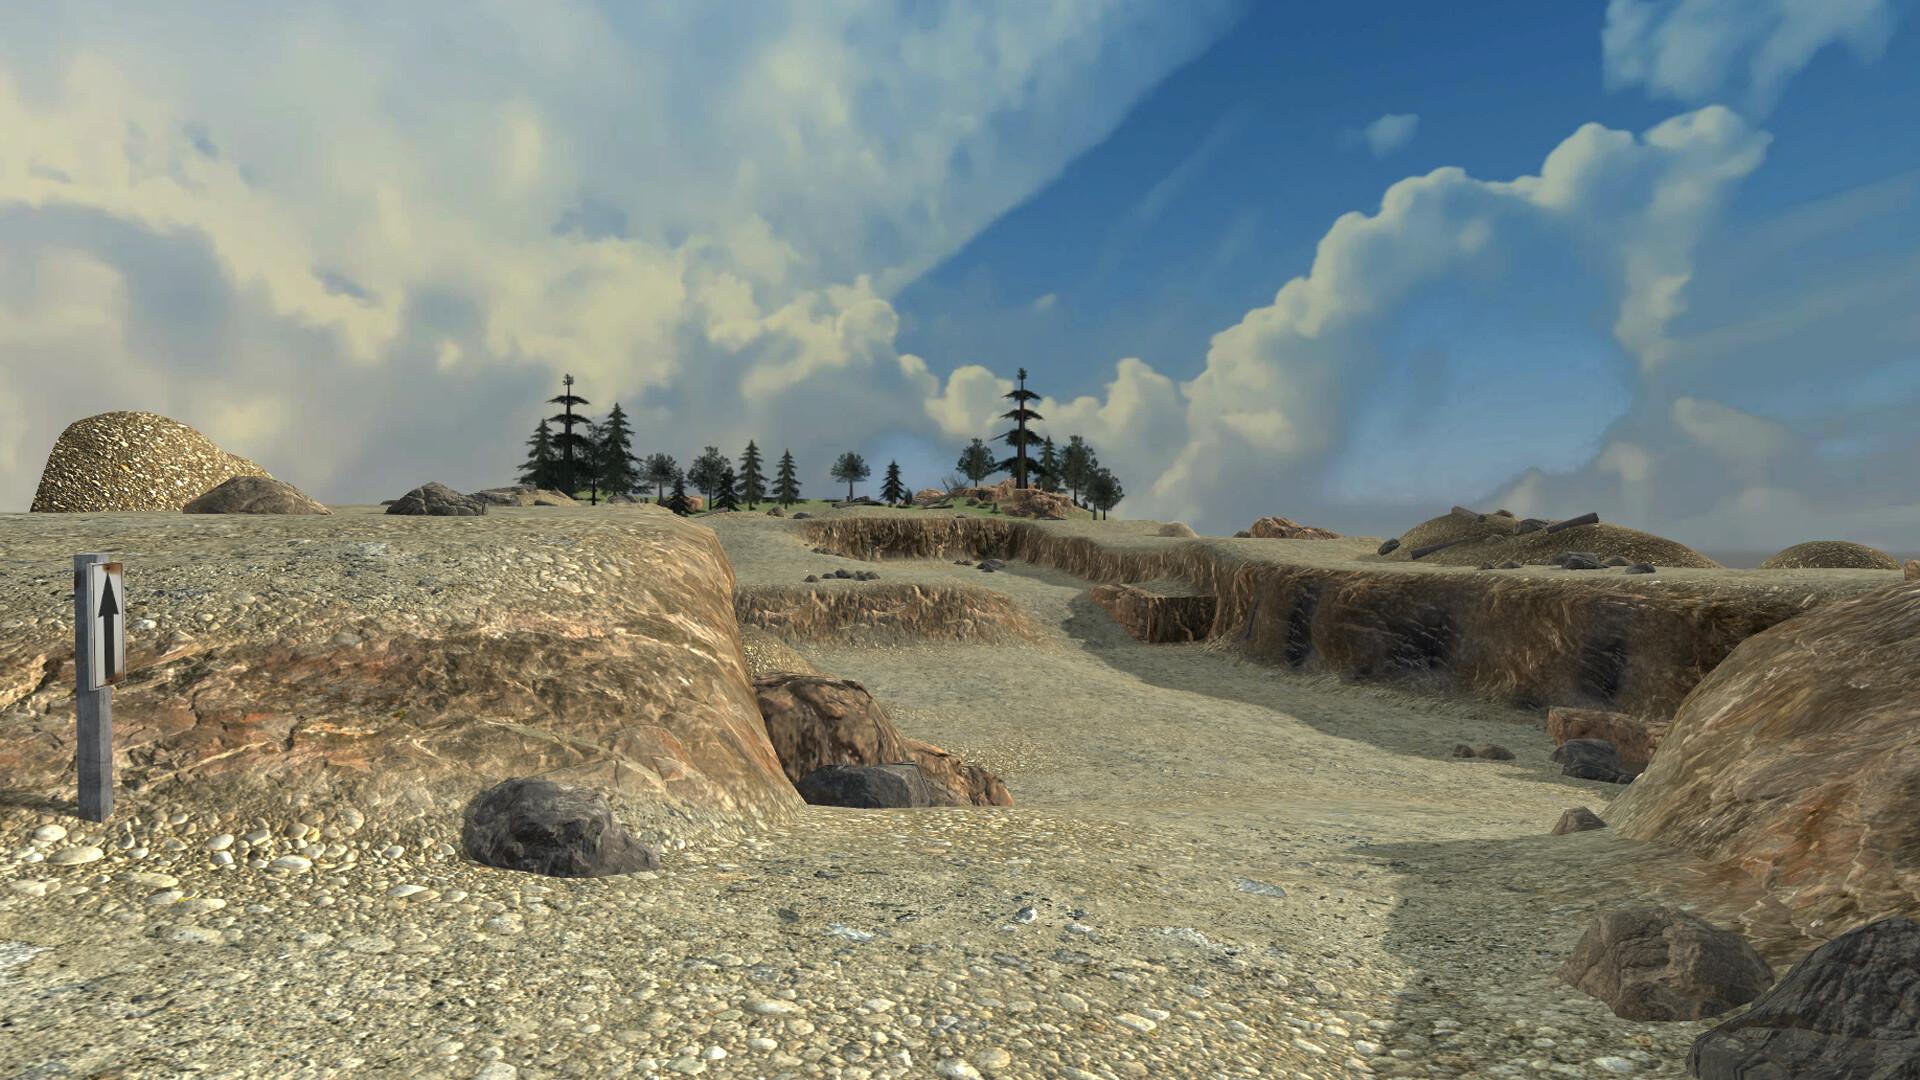 Jordan cameron quarry 17